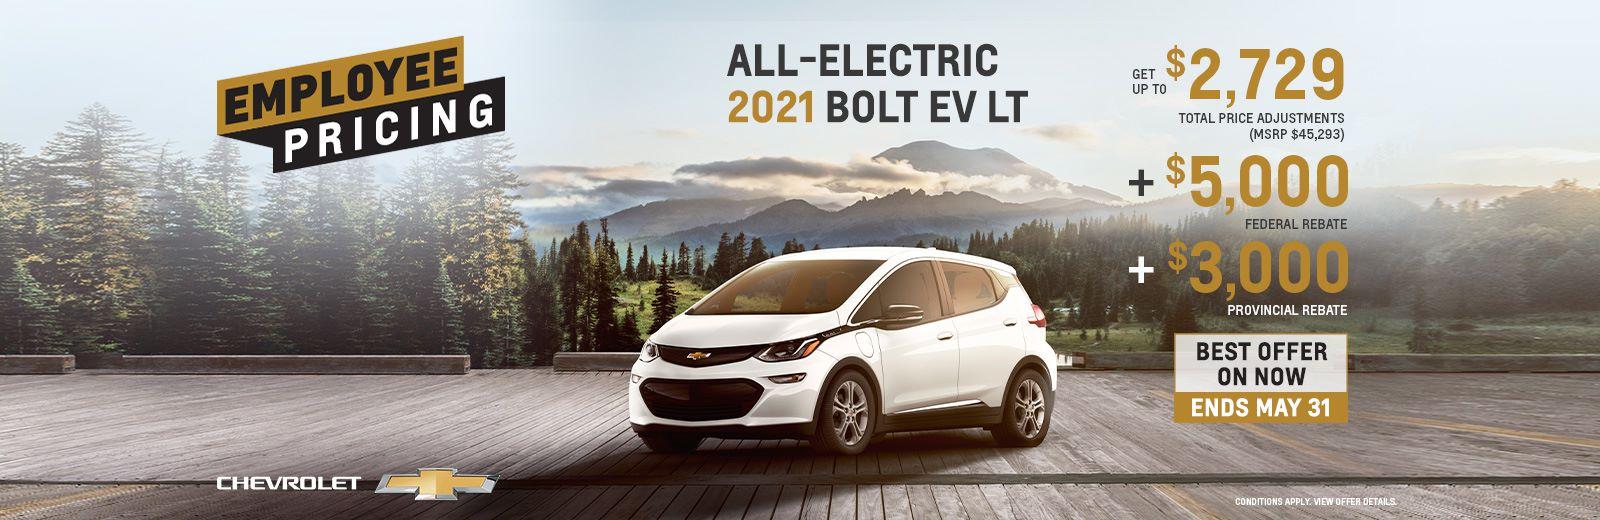 2021 chevrolet bolt ev electric vehicle carter gm burnaby carter gm northshore bc